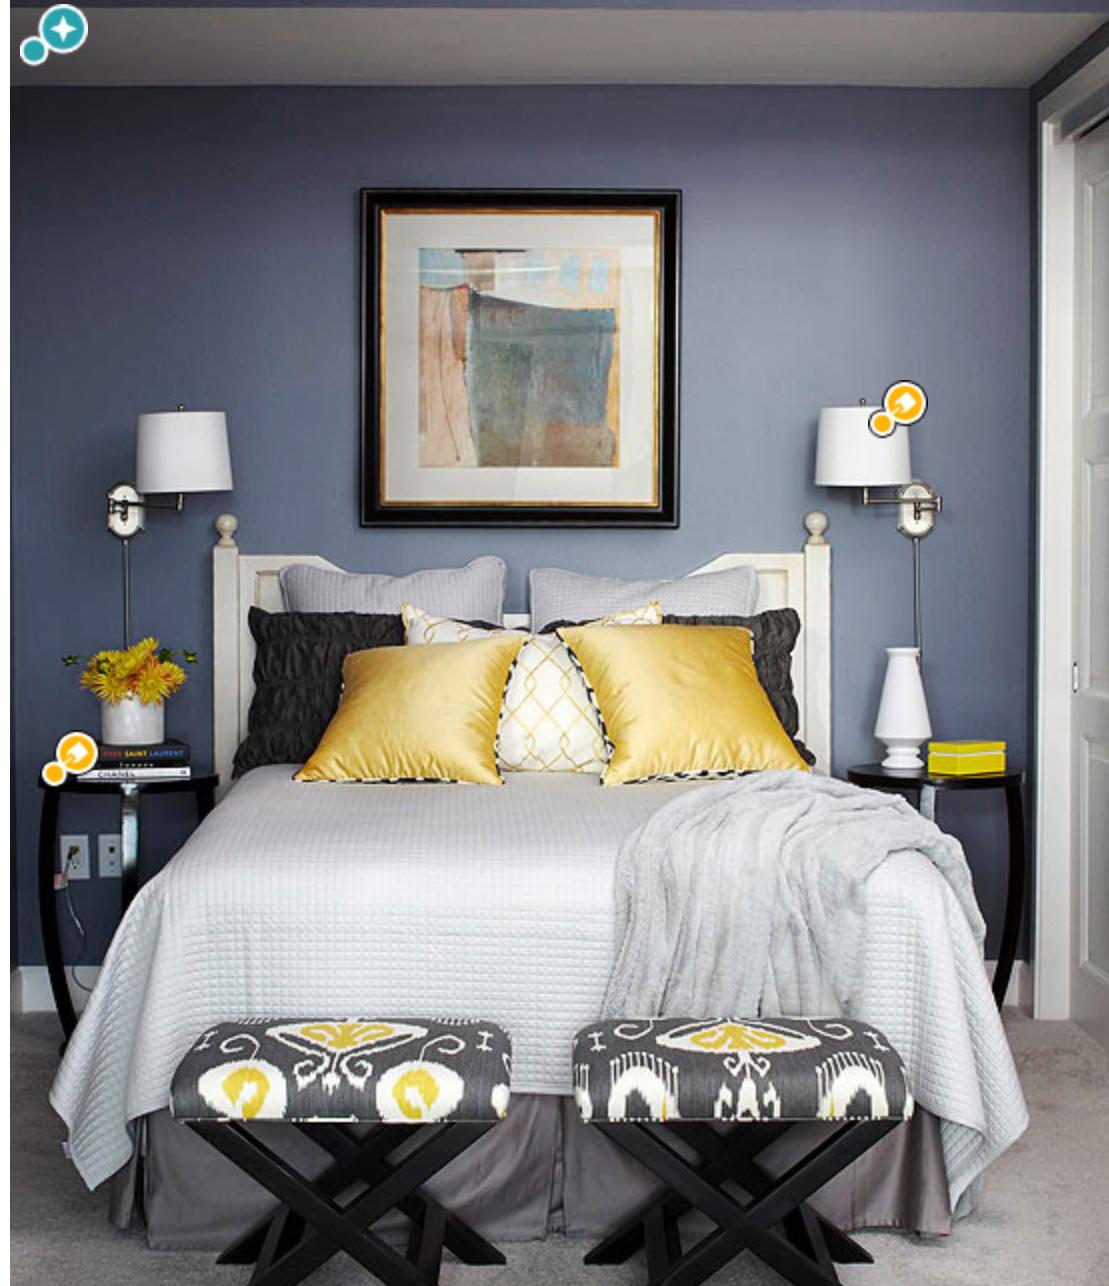 Yellow Blue Bedroom Decorating Ideas Purple Bedroom Bin Bedroom Door Installation Kit Bedroom Wallpaper Designs 2015: This Concept But With The Purple Sparkle Bedding And Head